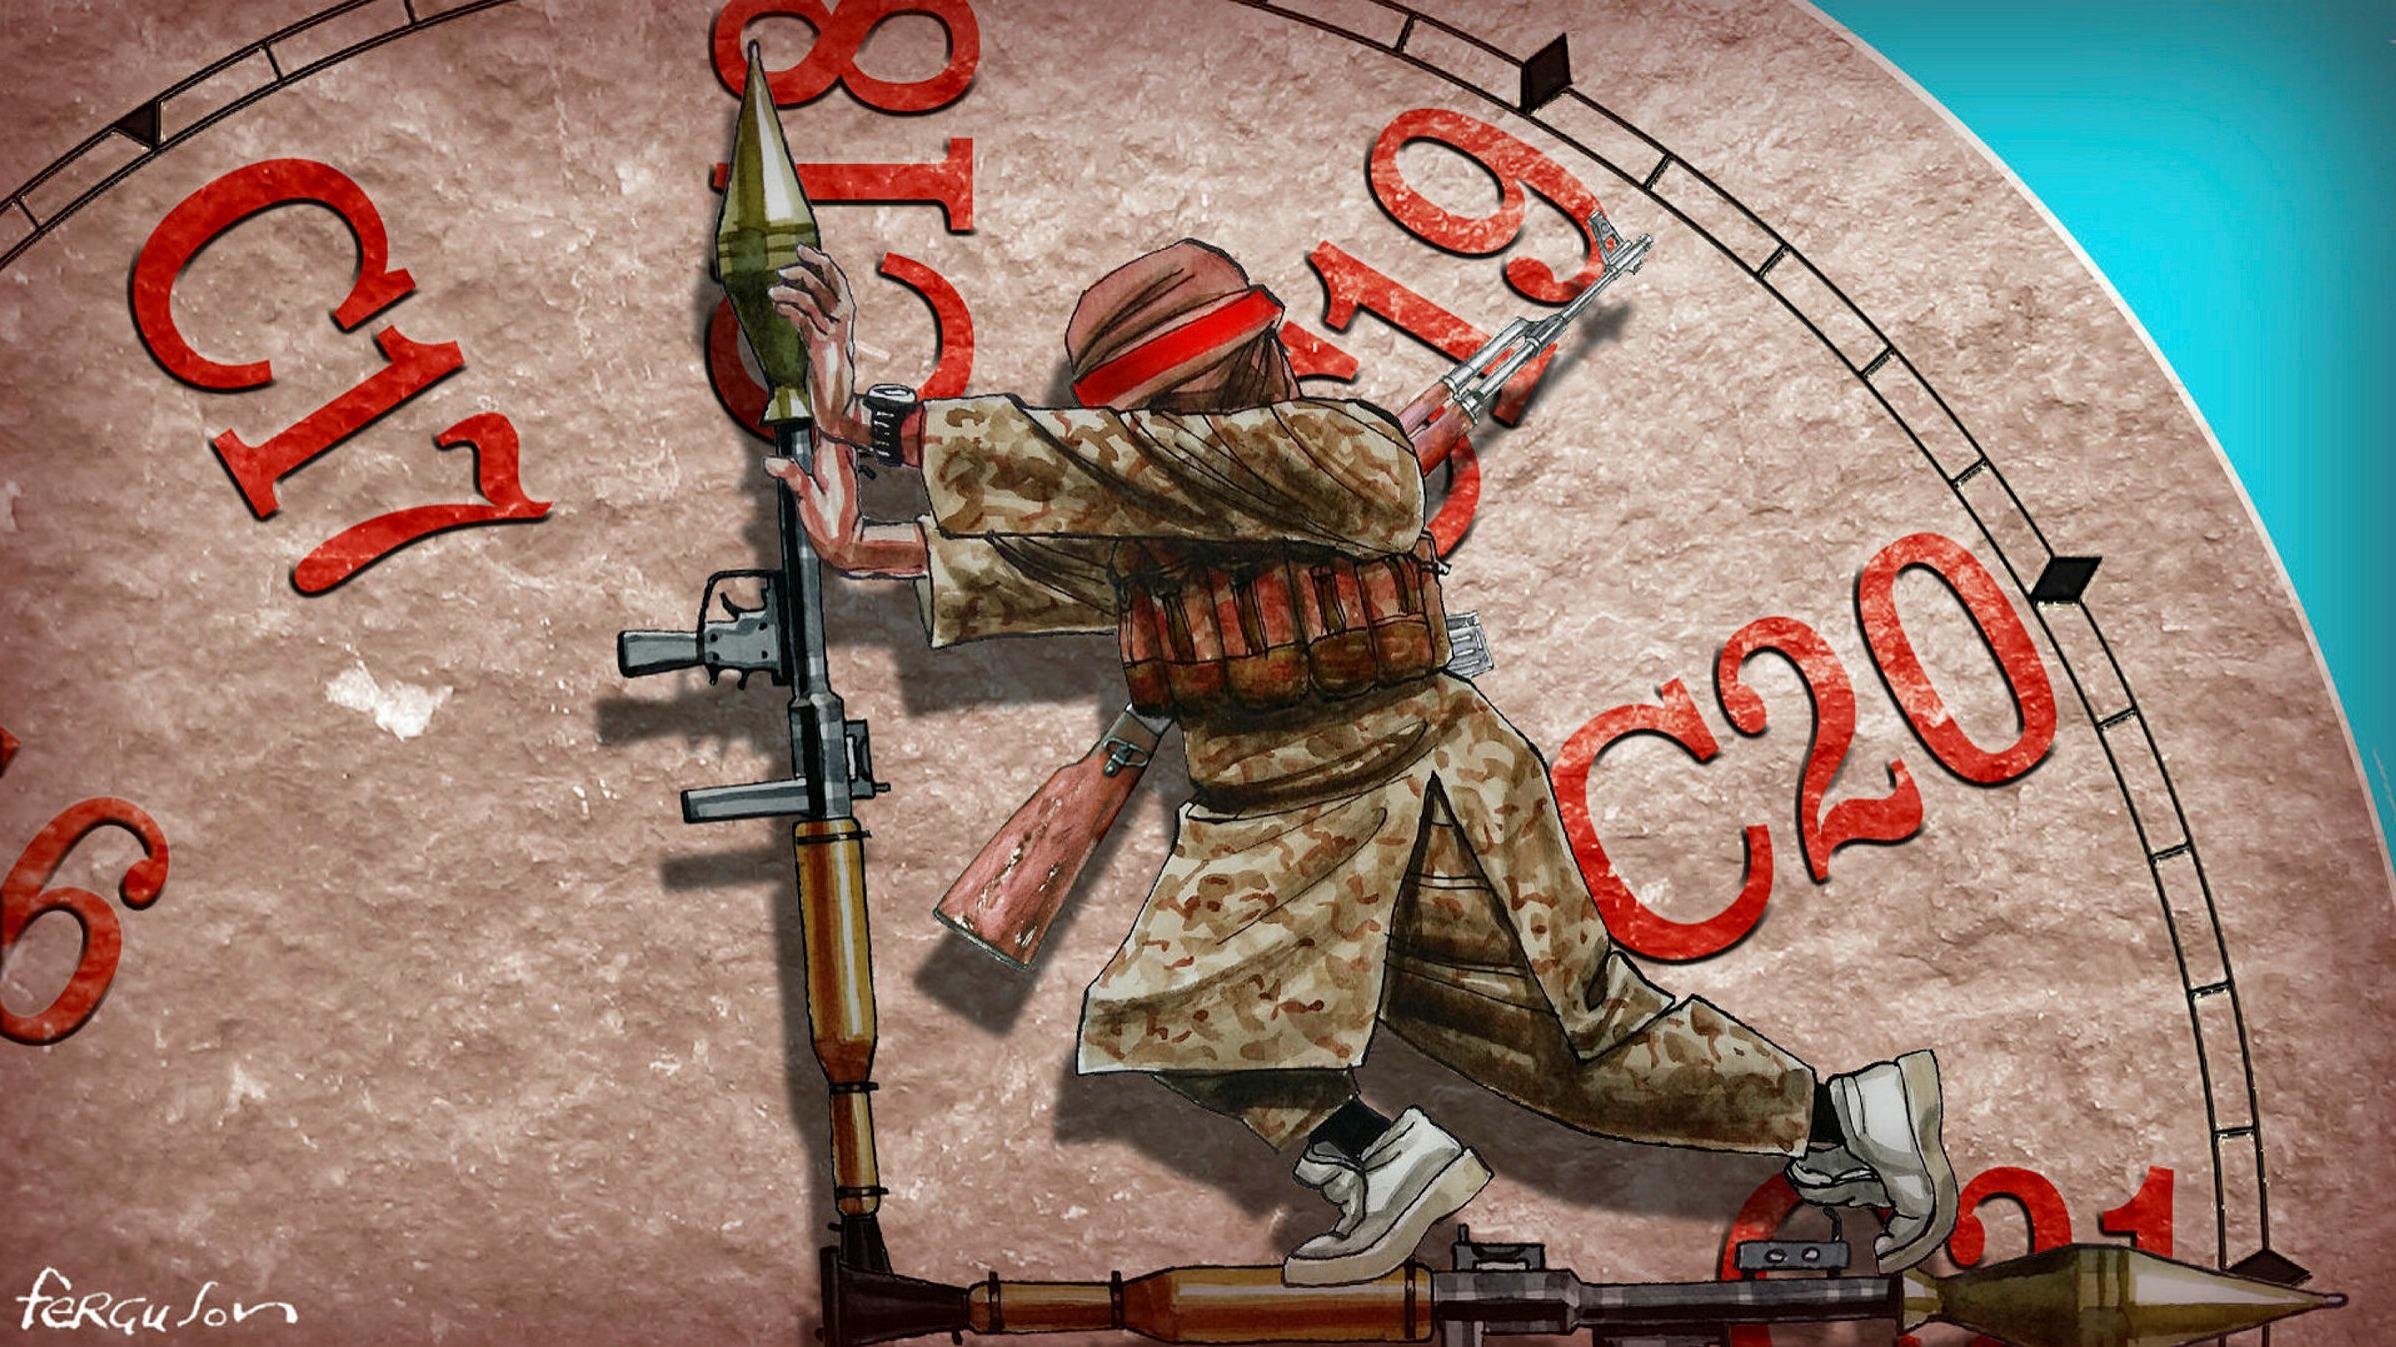 Post-USA Afghanistan By UK Dar